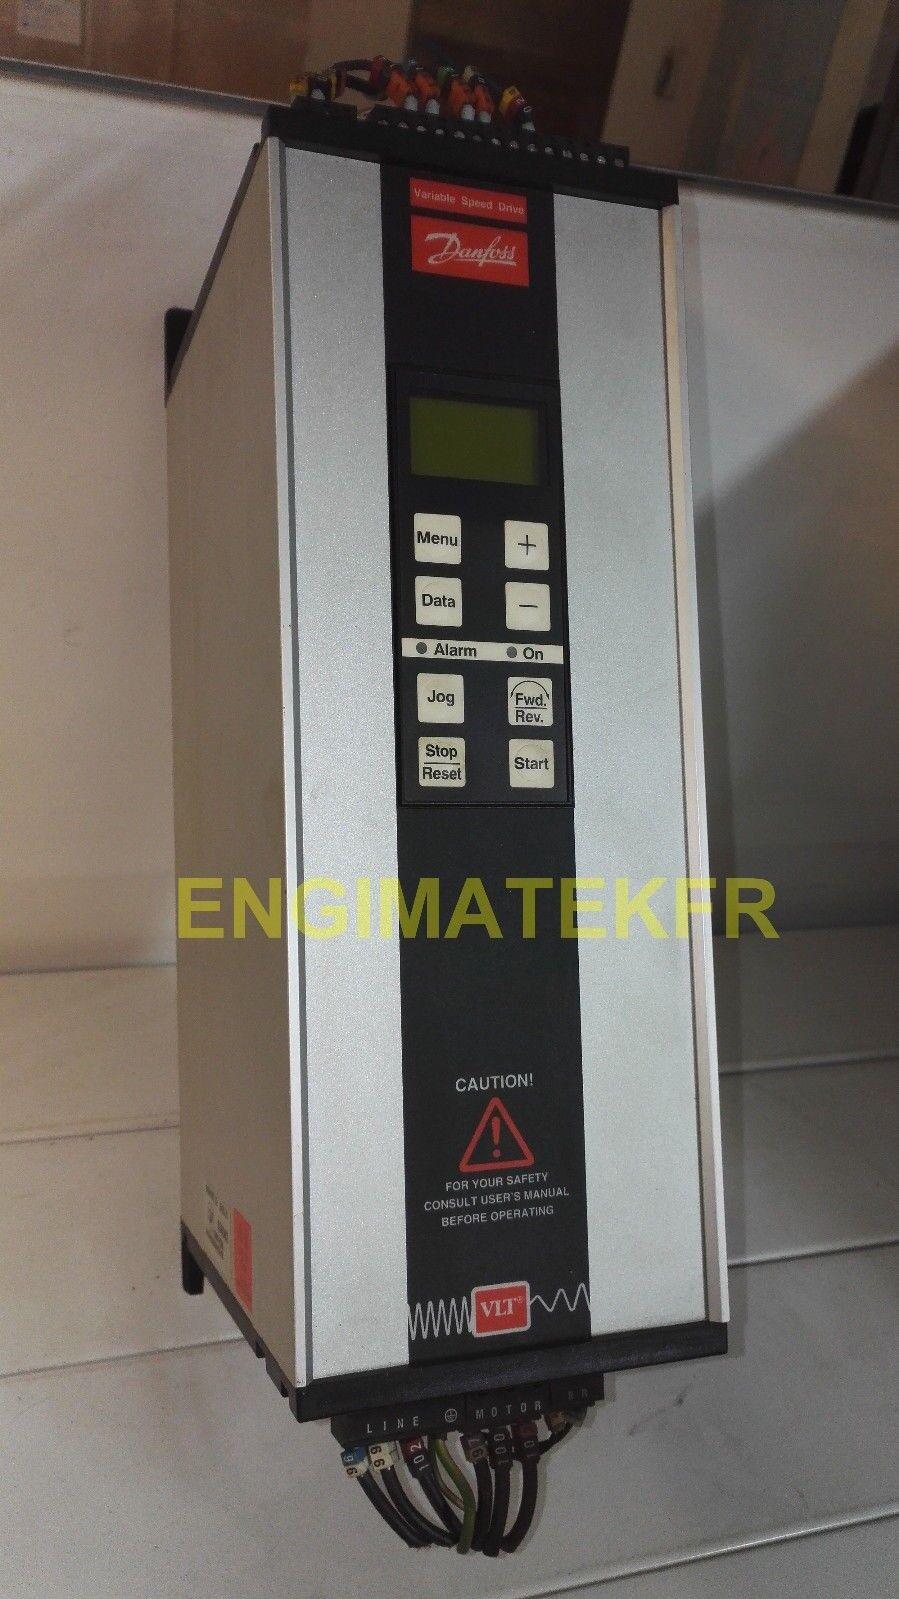 variateur vitesse 0-500HZ Danfoss VLT type 2020 195H3401 2.4kW 1.9KVA 1.9KVA 1.9KVA 565ebf